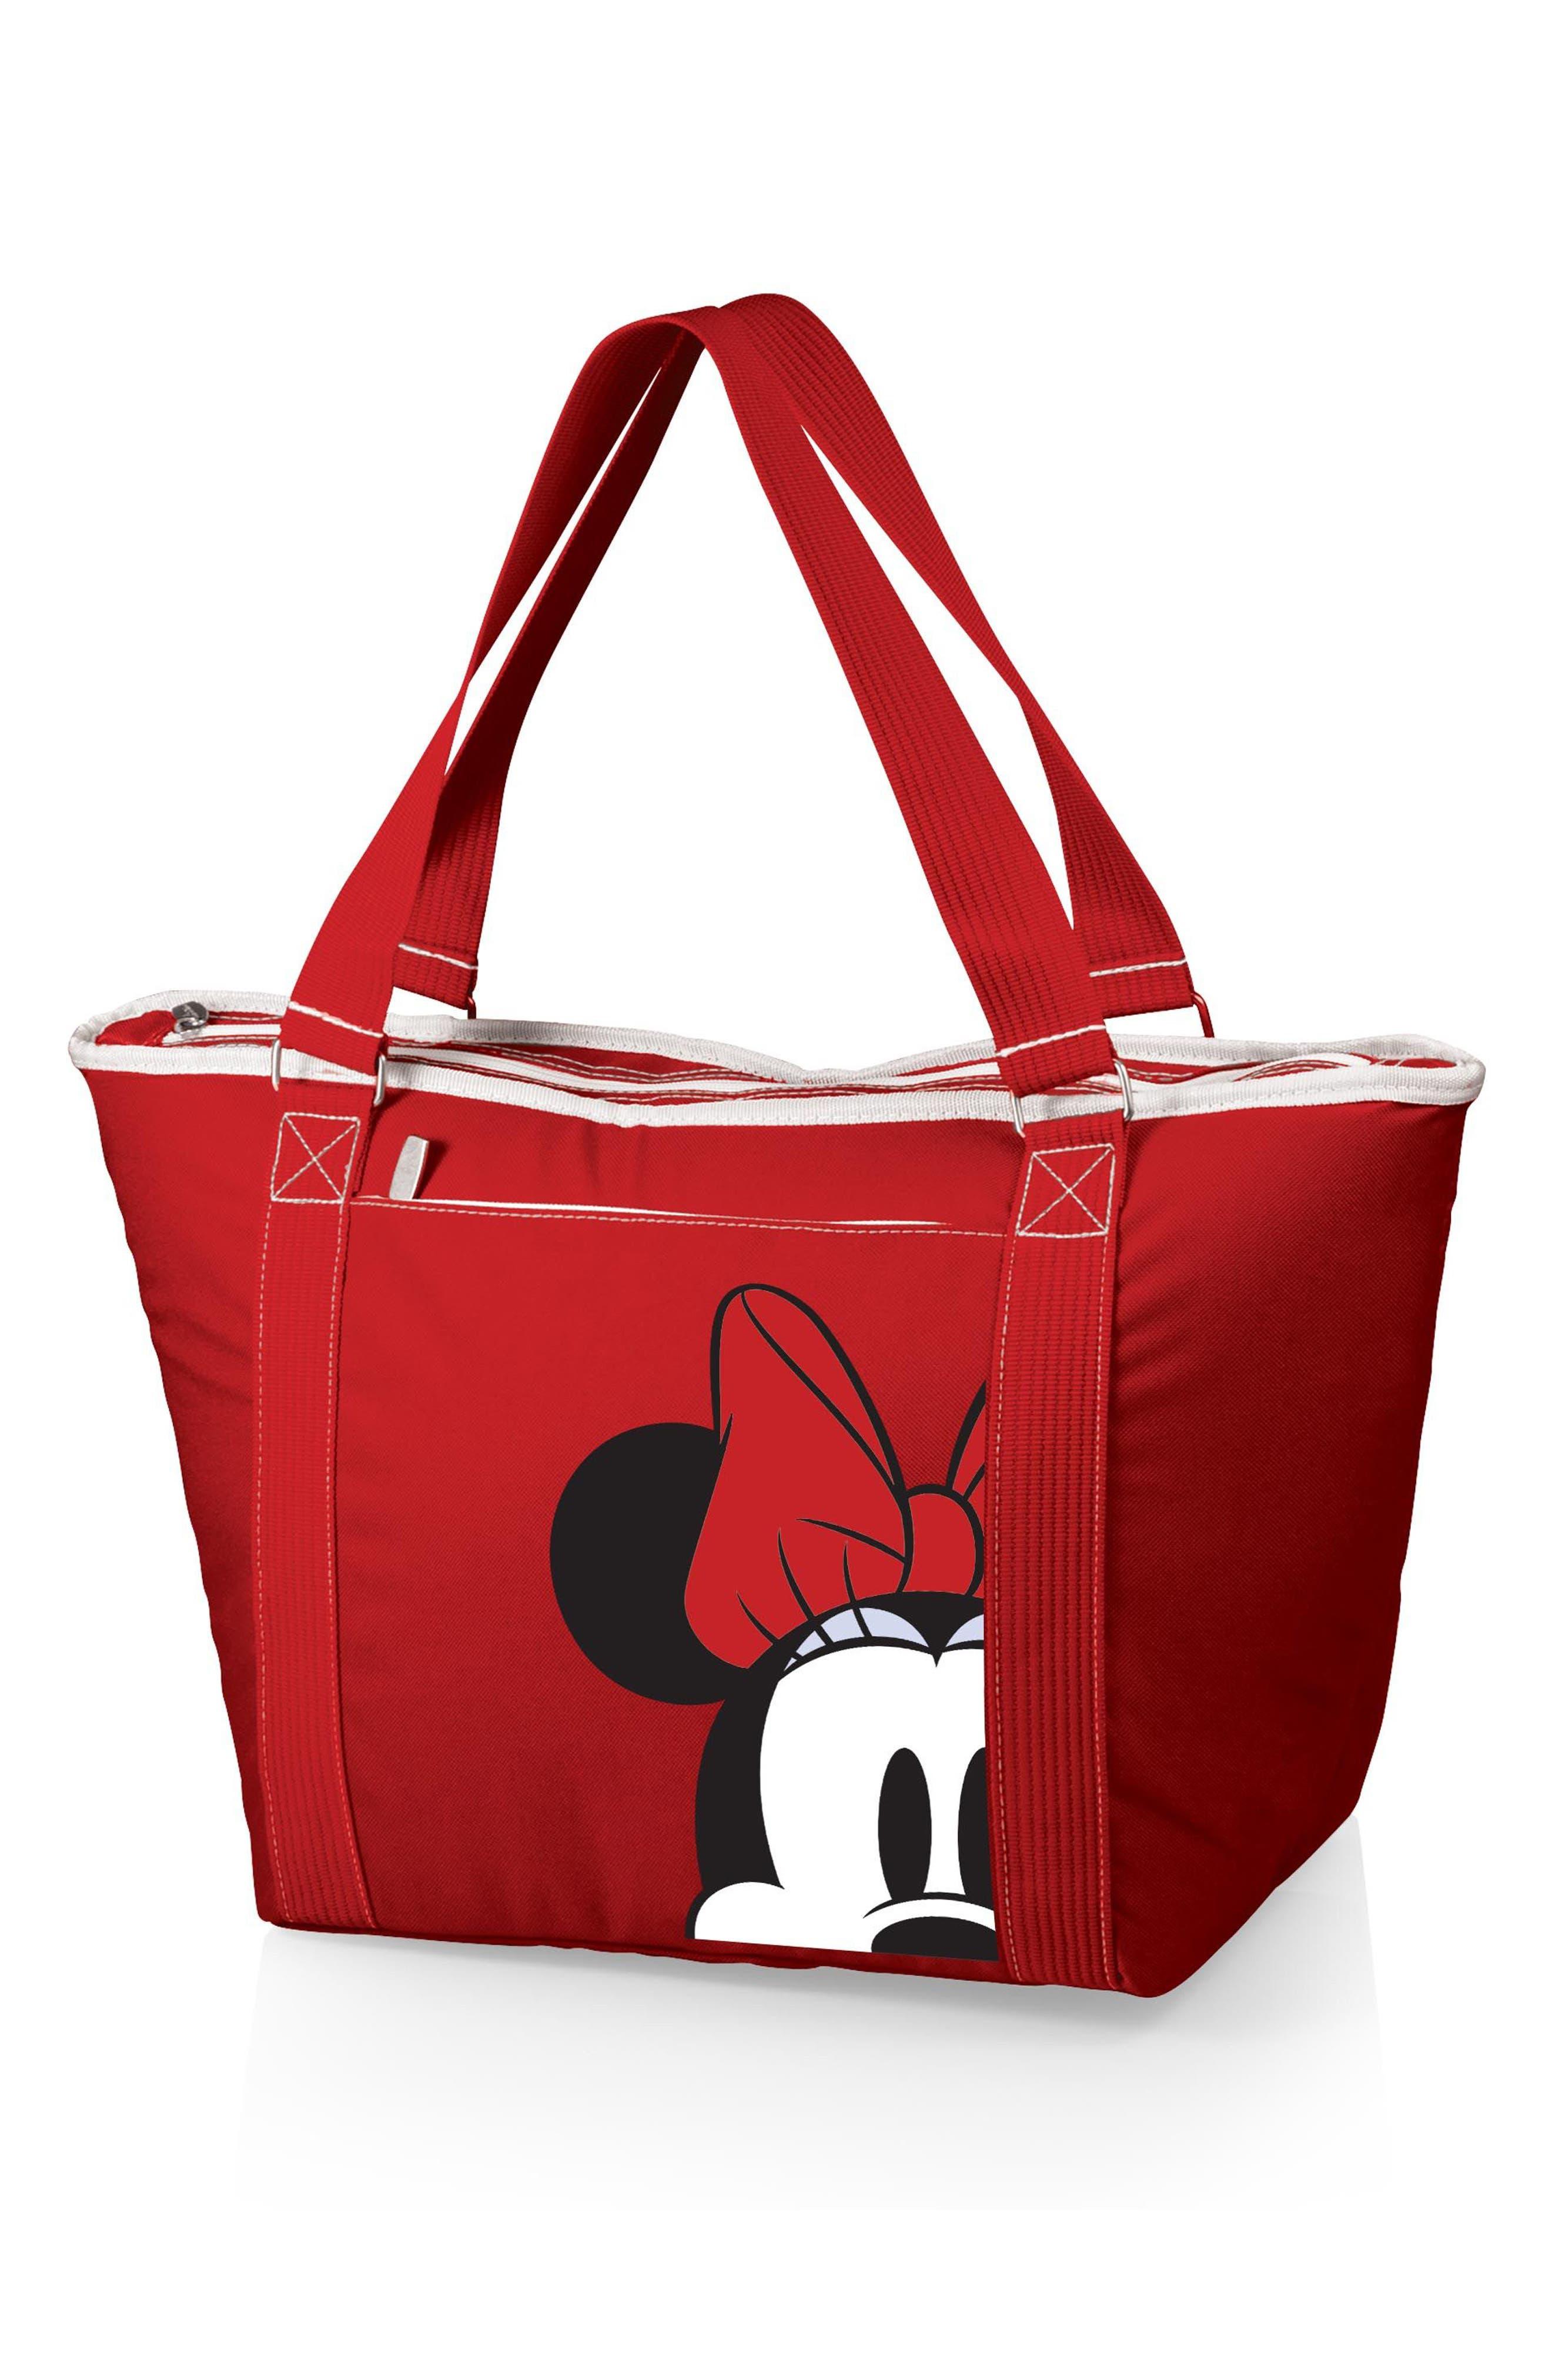 Disney<sup>®</sup> Mickey Mouse Topanga Cooler Tote,                             Main thumbnail 1, color,                             Minnie